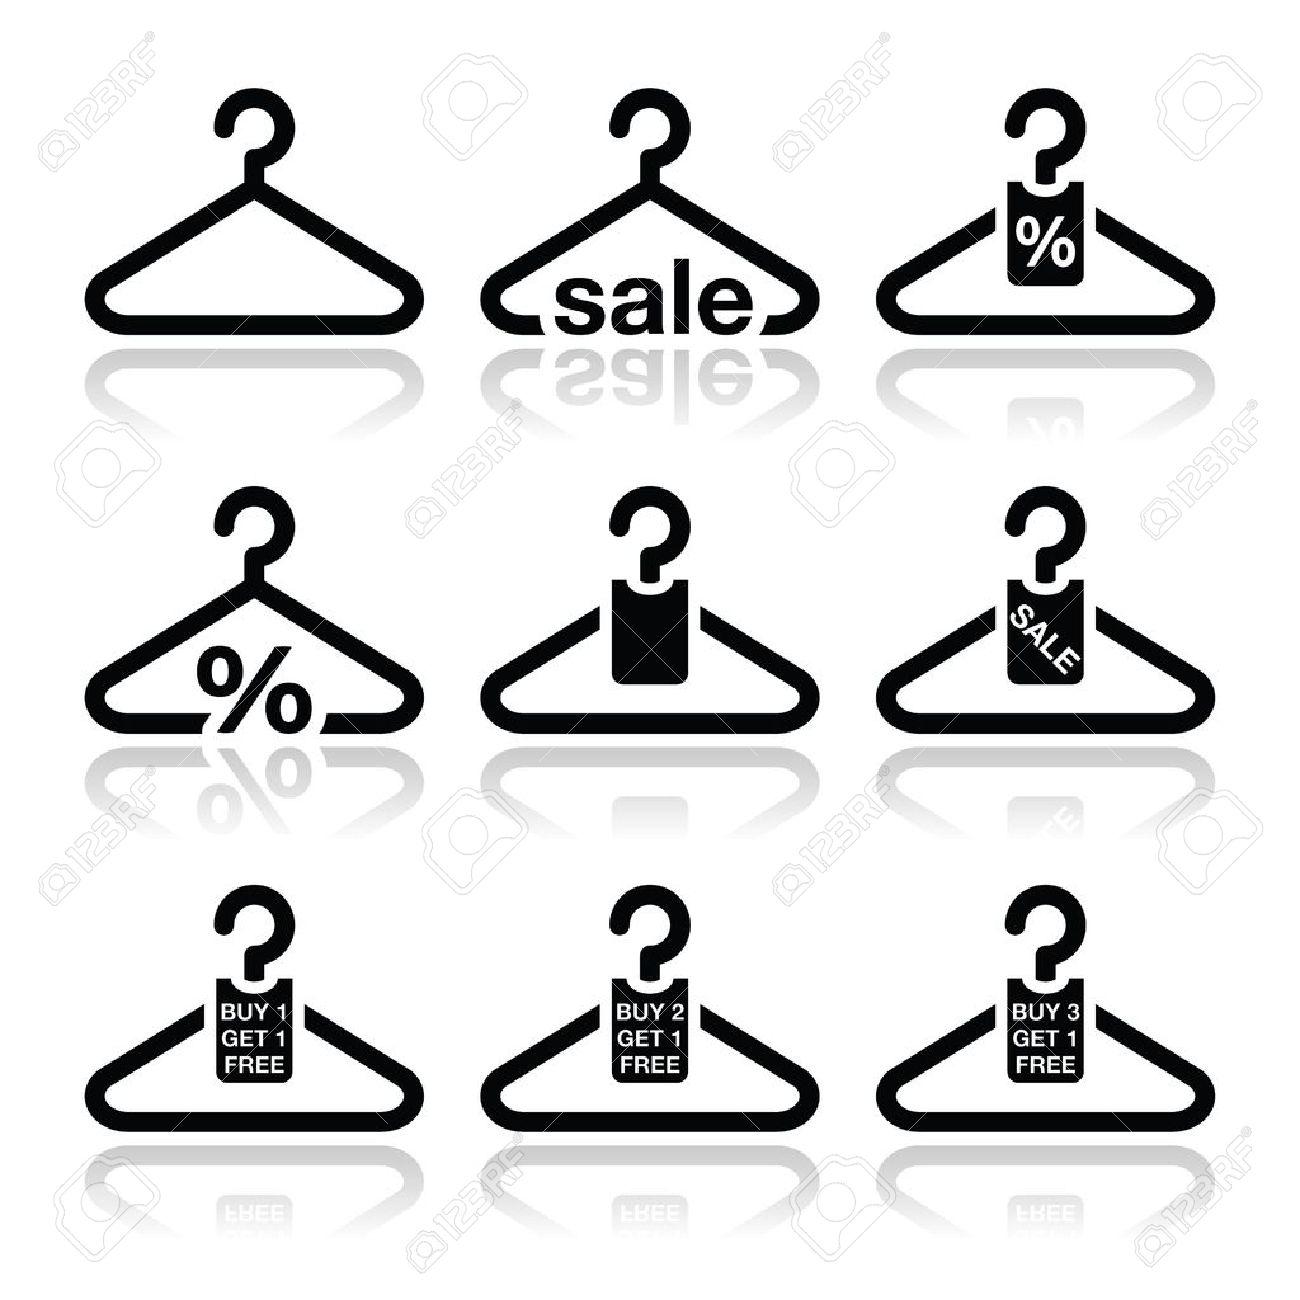 Hanger, sale, buy 1 get 1 free icons set Stock Vector - 18952193